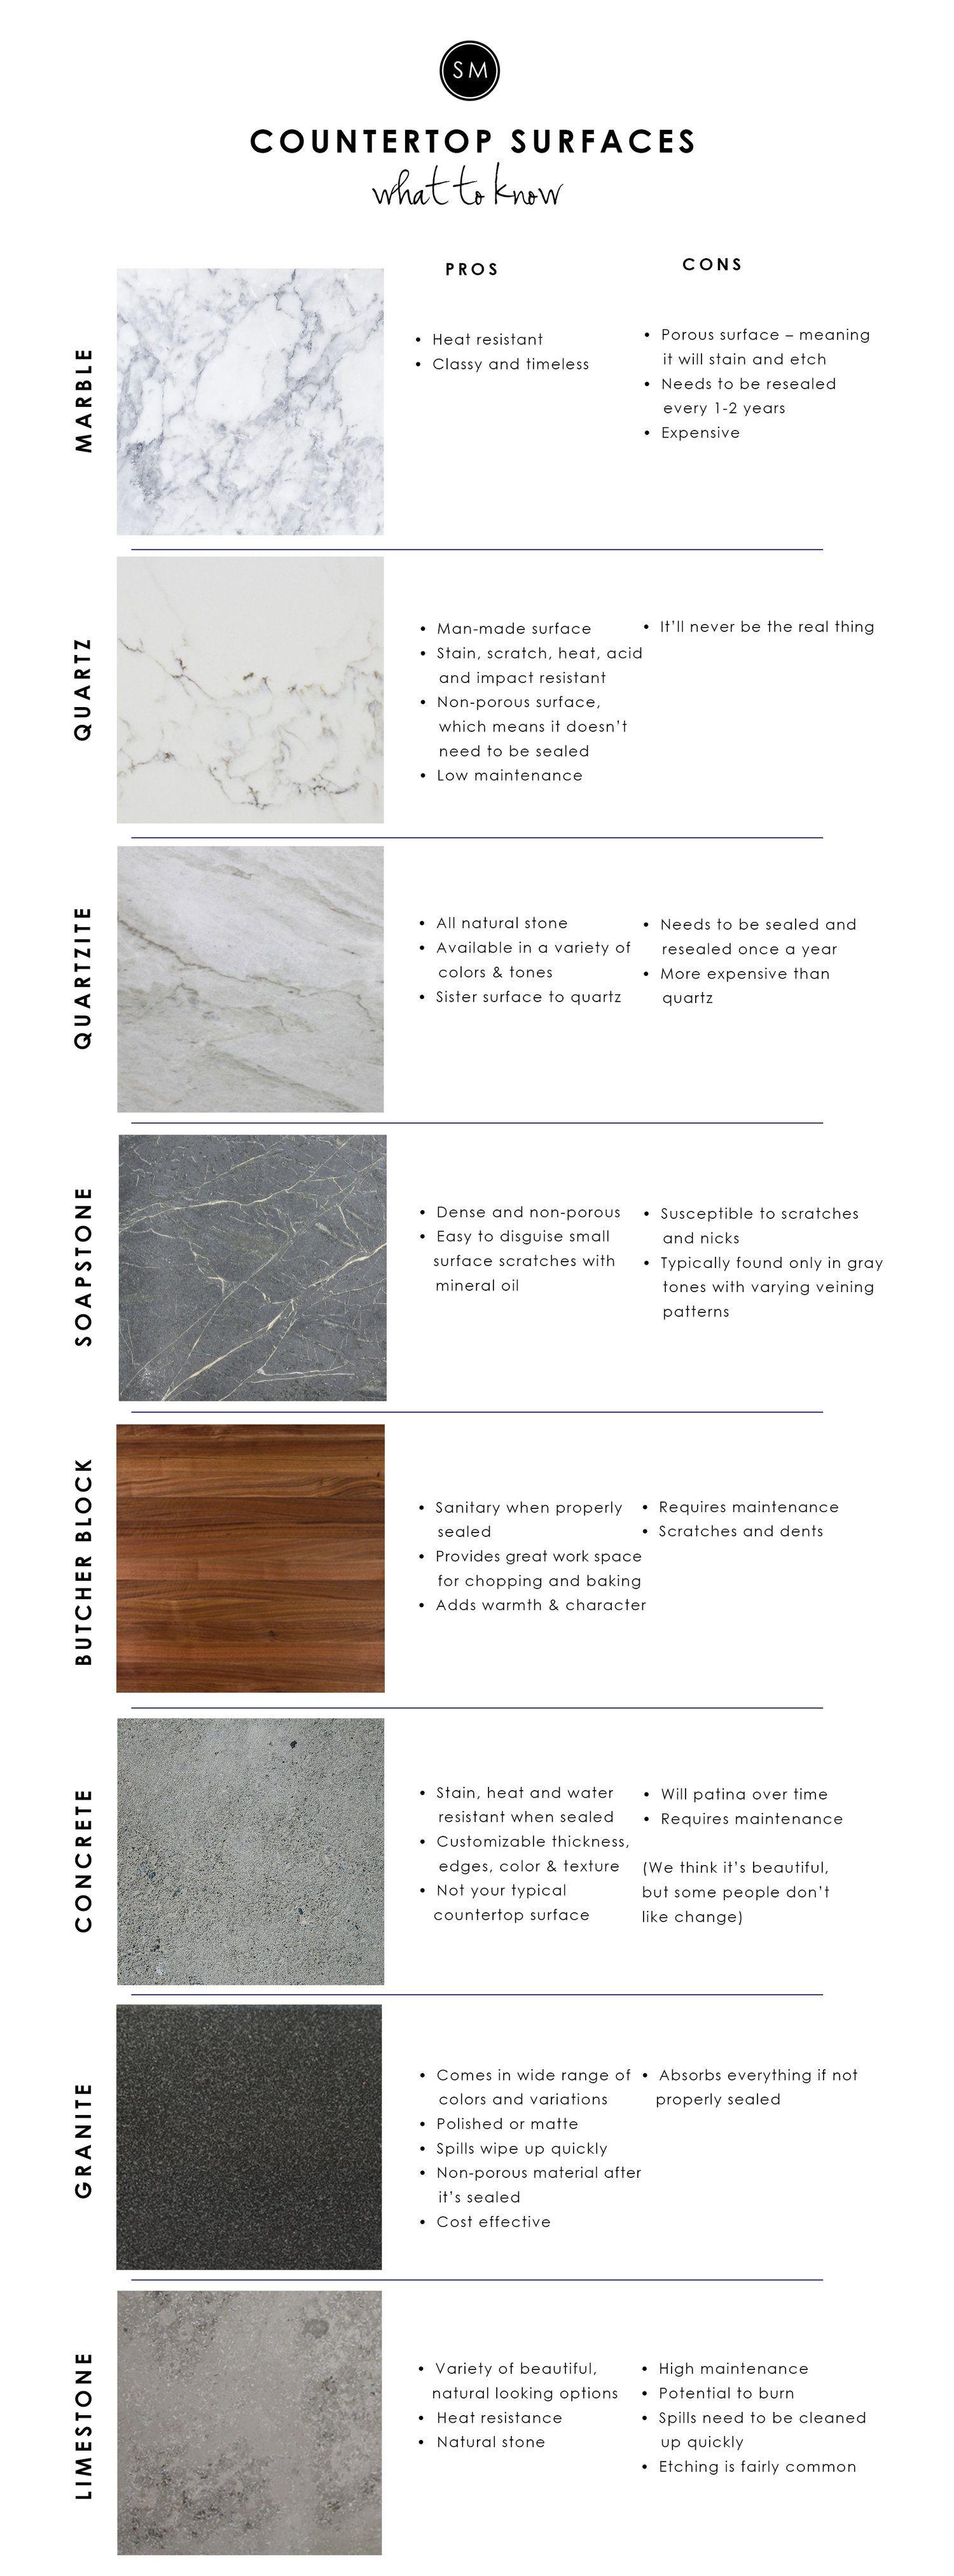 Kitchen Countertop Surfaces 101